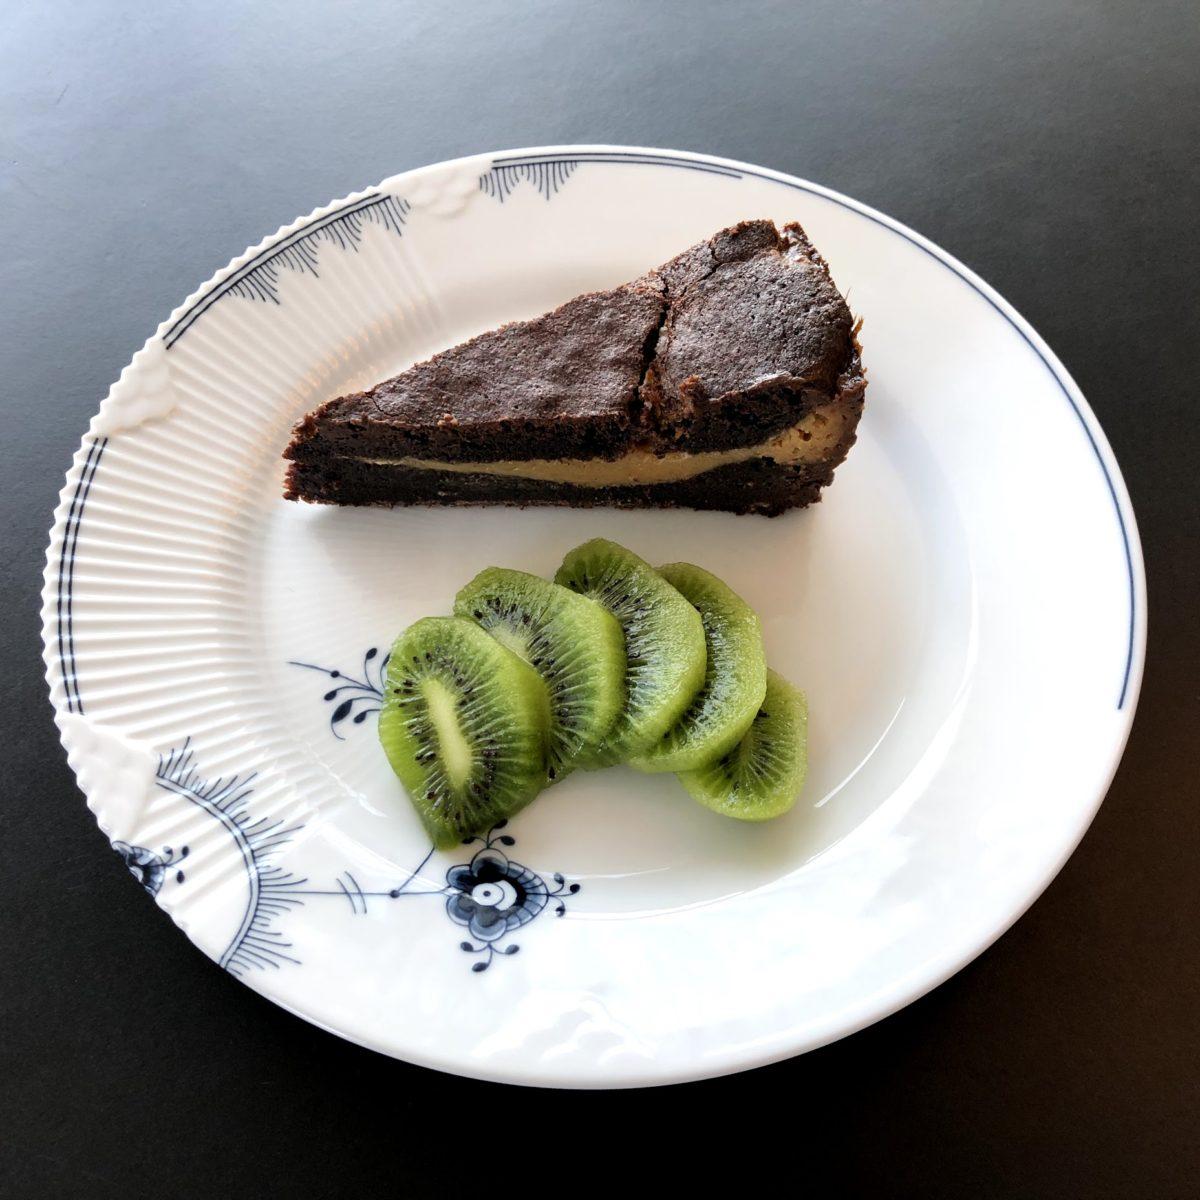 brownie med karamelmidte karamel-midte karamel opskrift på god opskrift dessert desert